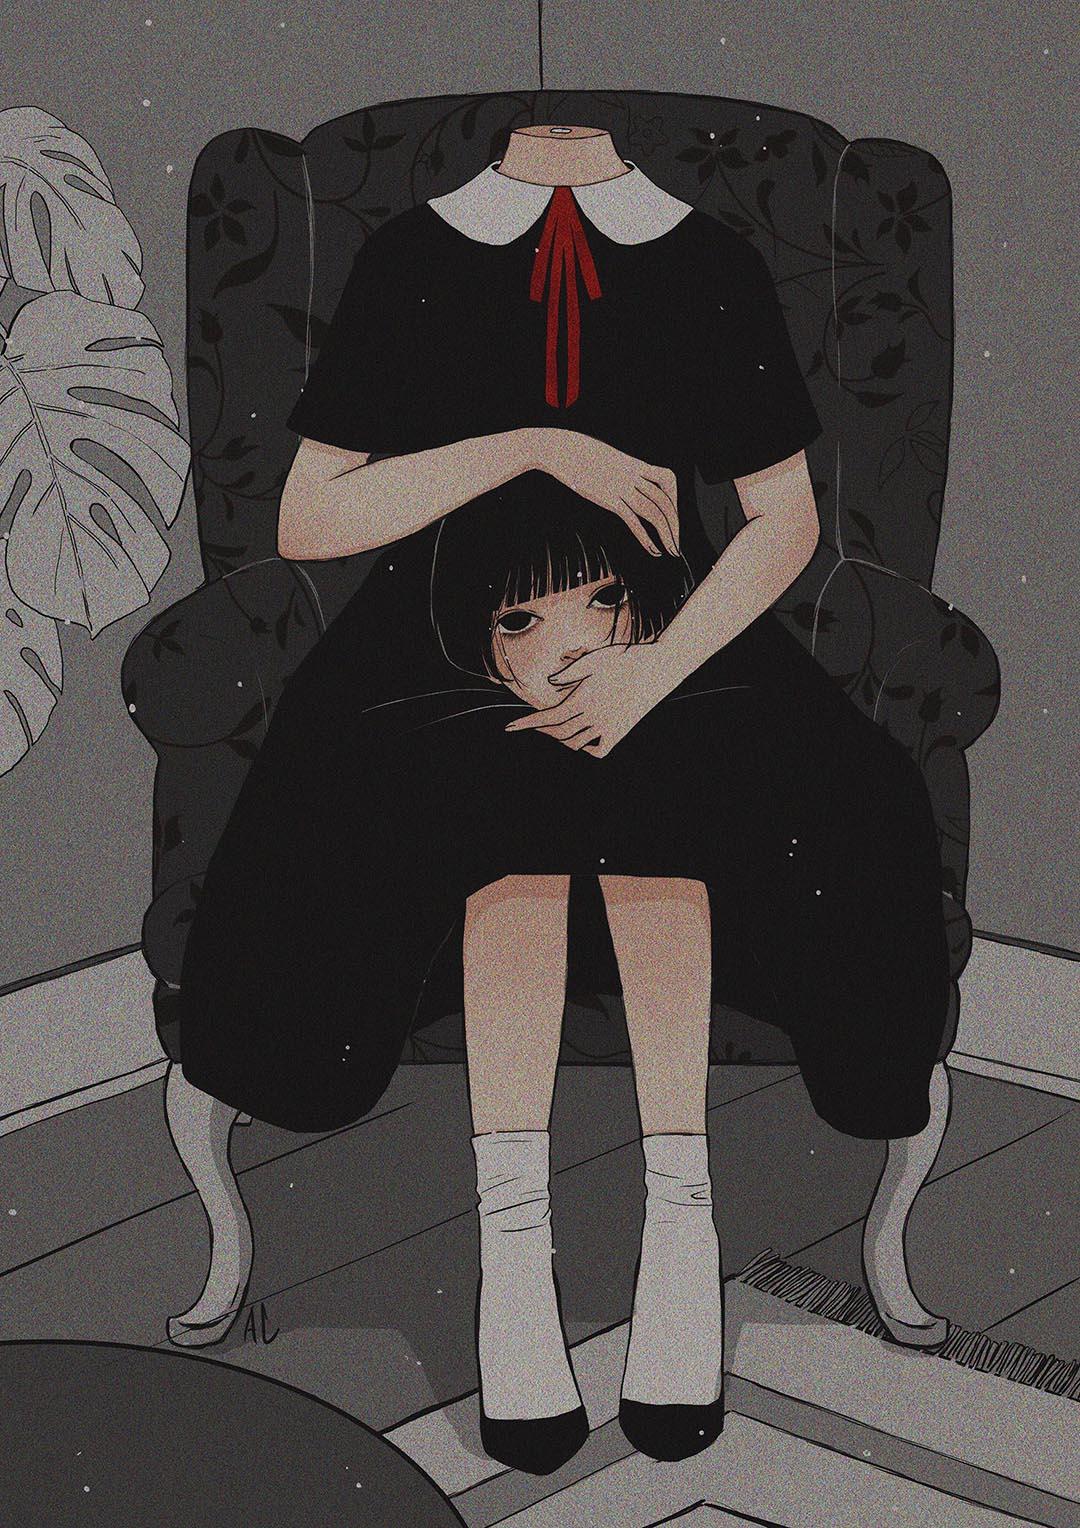 GirlsclubAsia-Illustrator-Anwita Citriya-7